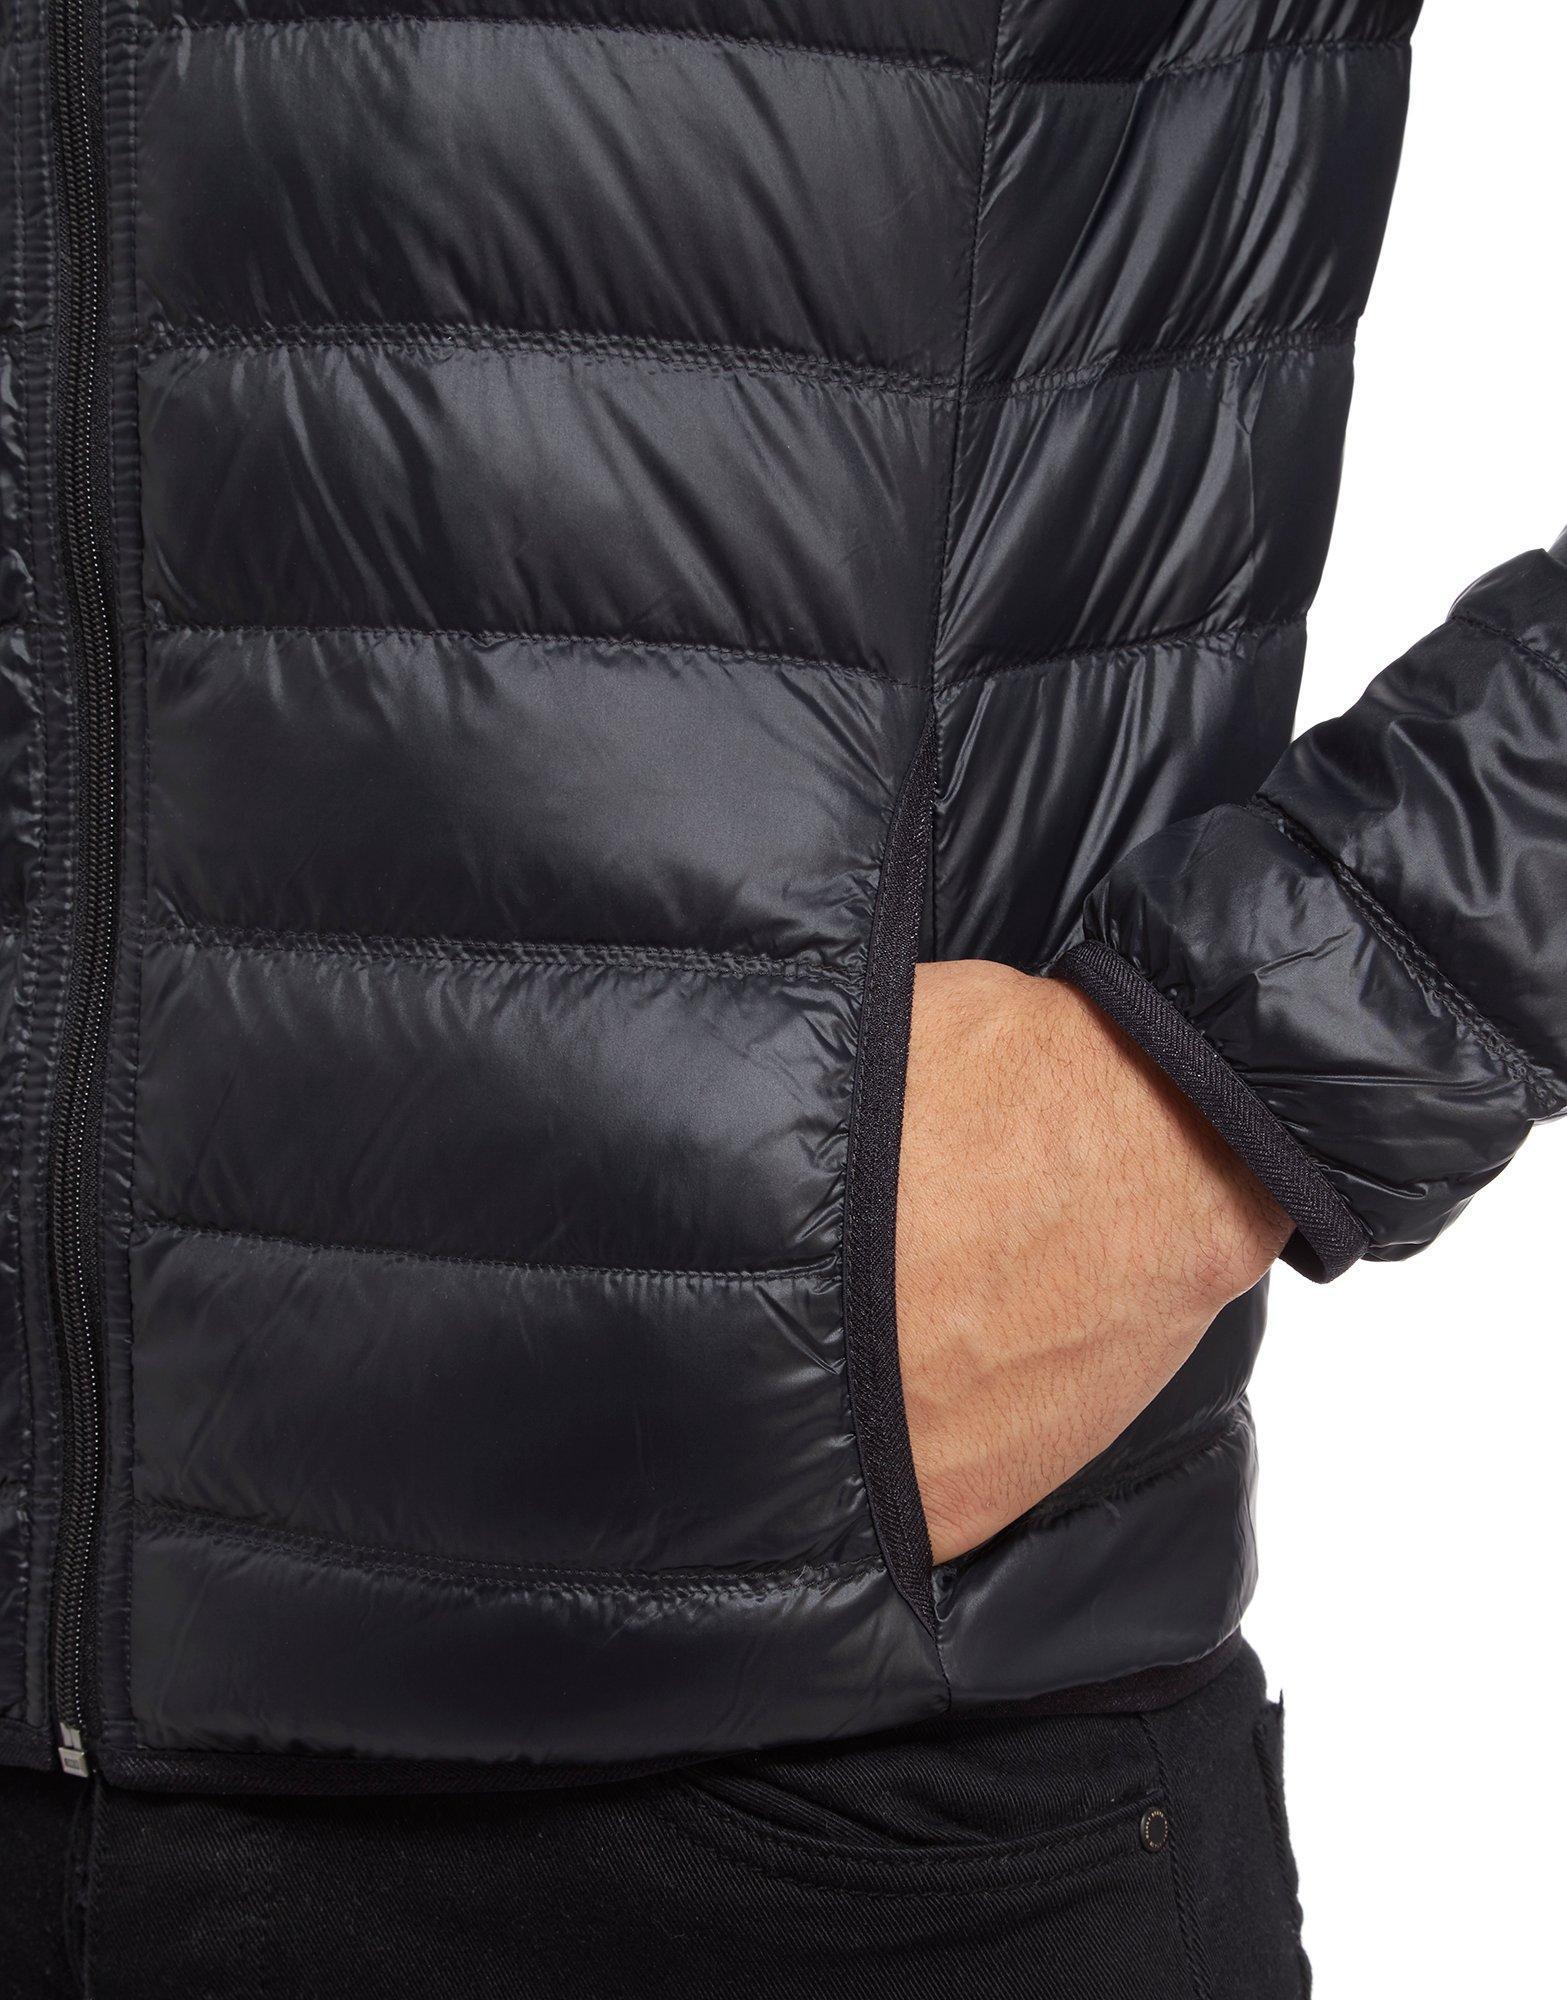 EA7 Synthetic Core Bubble Jacket in Black/White (Black) for Men